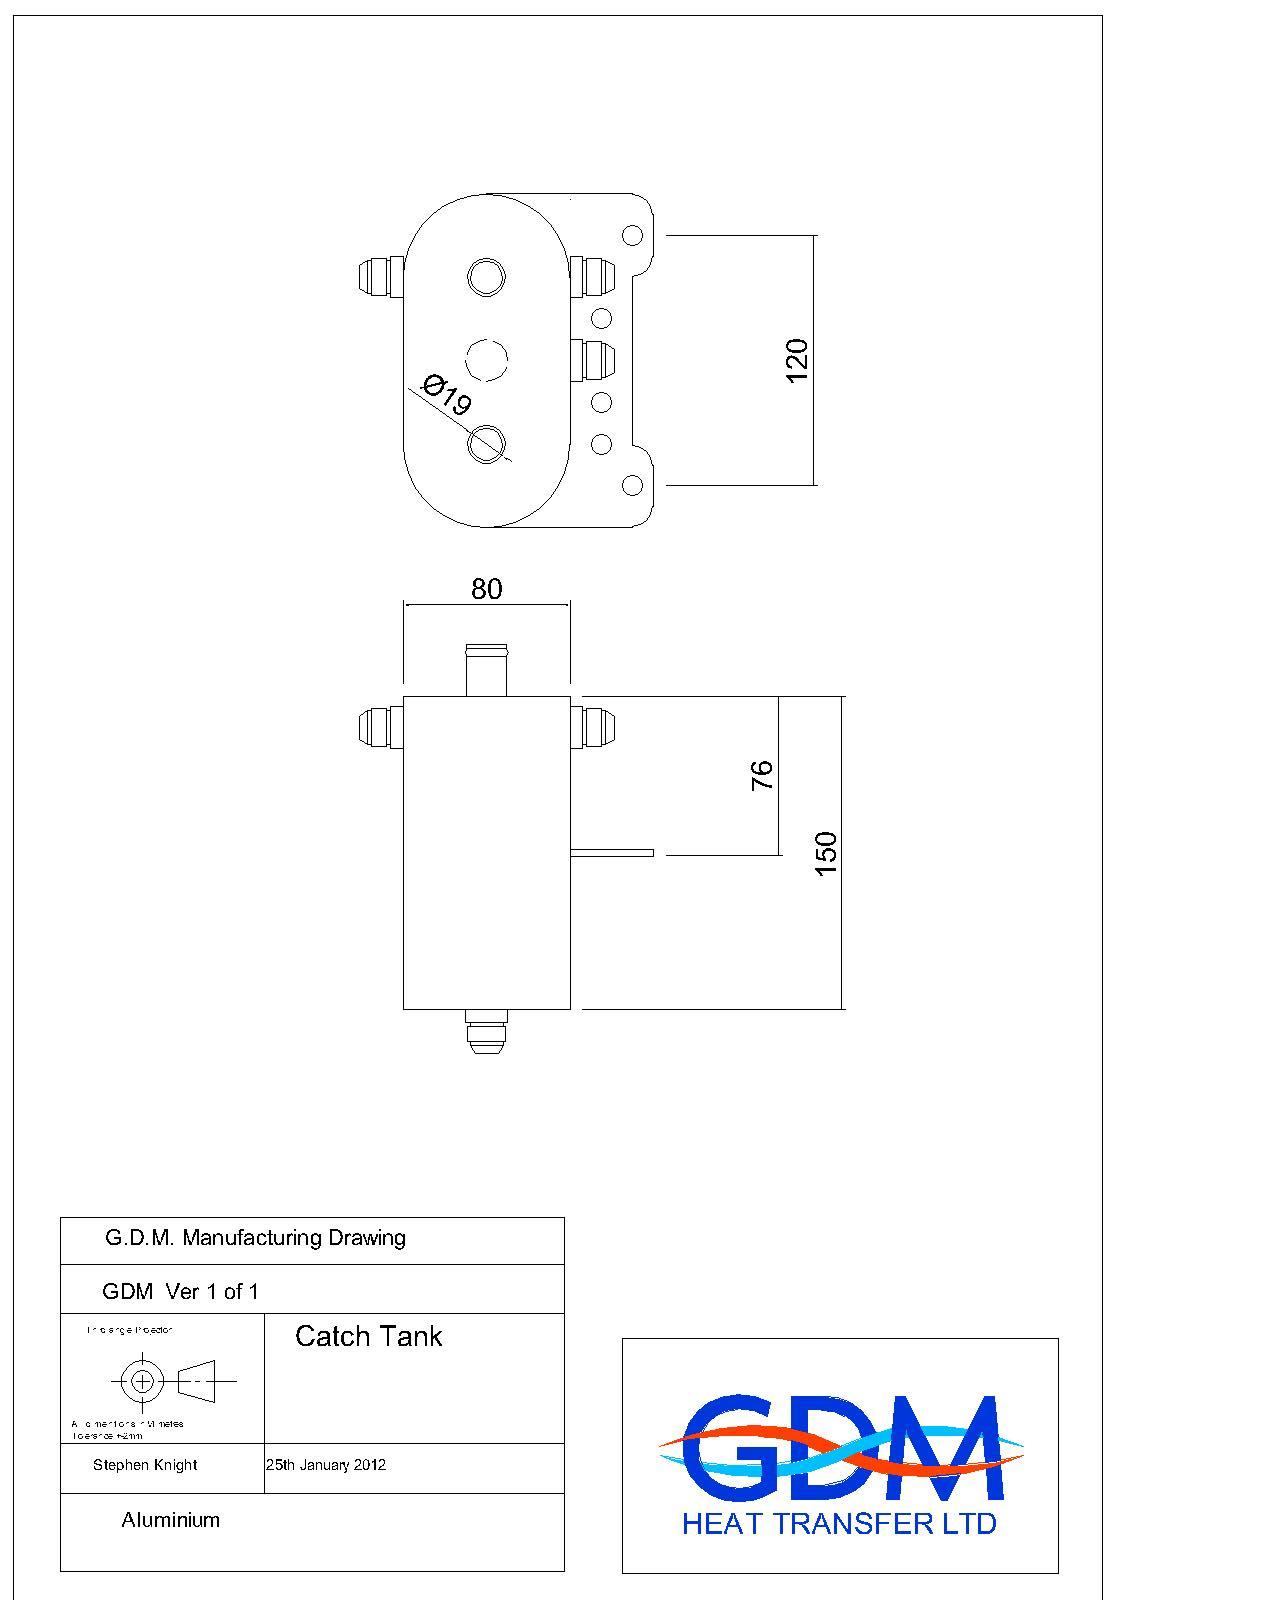 Honda Crx Gdm Motorsport